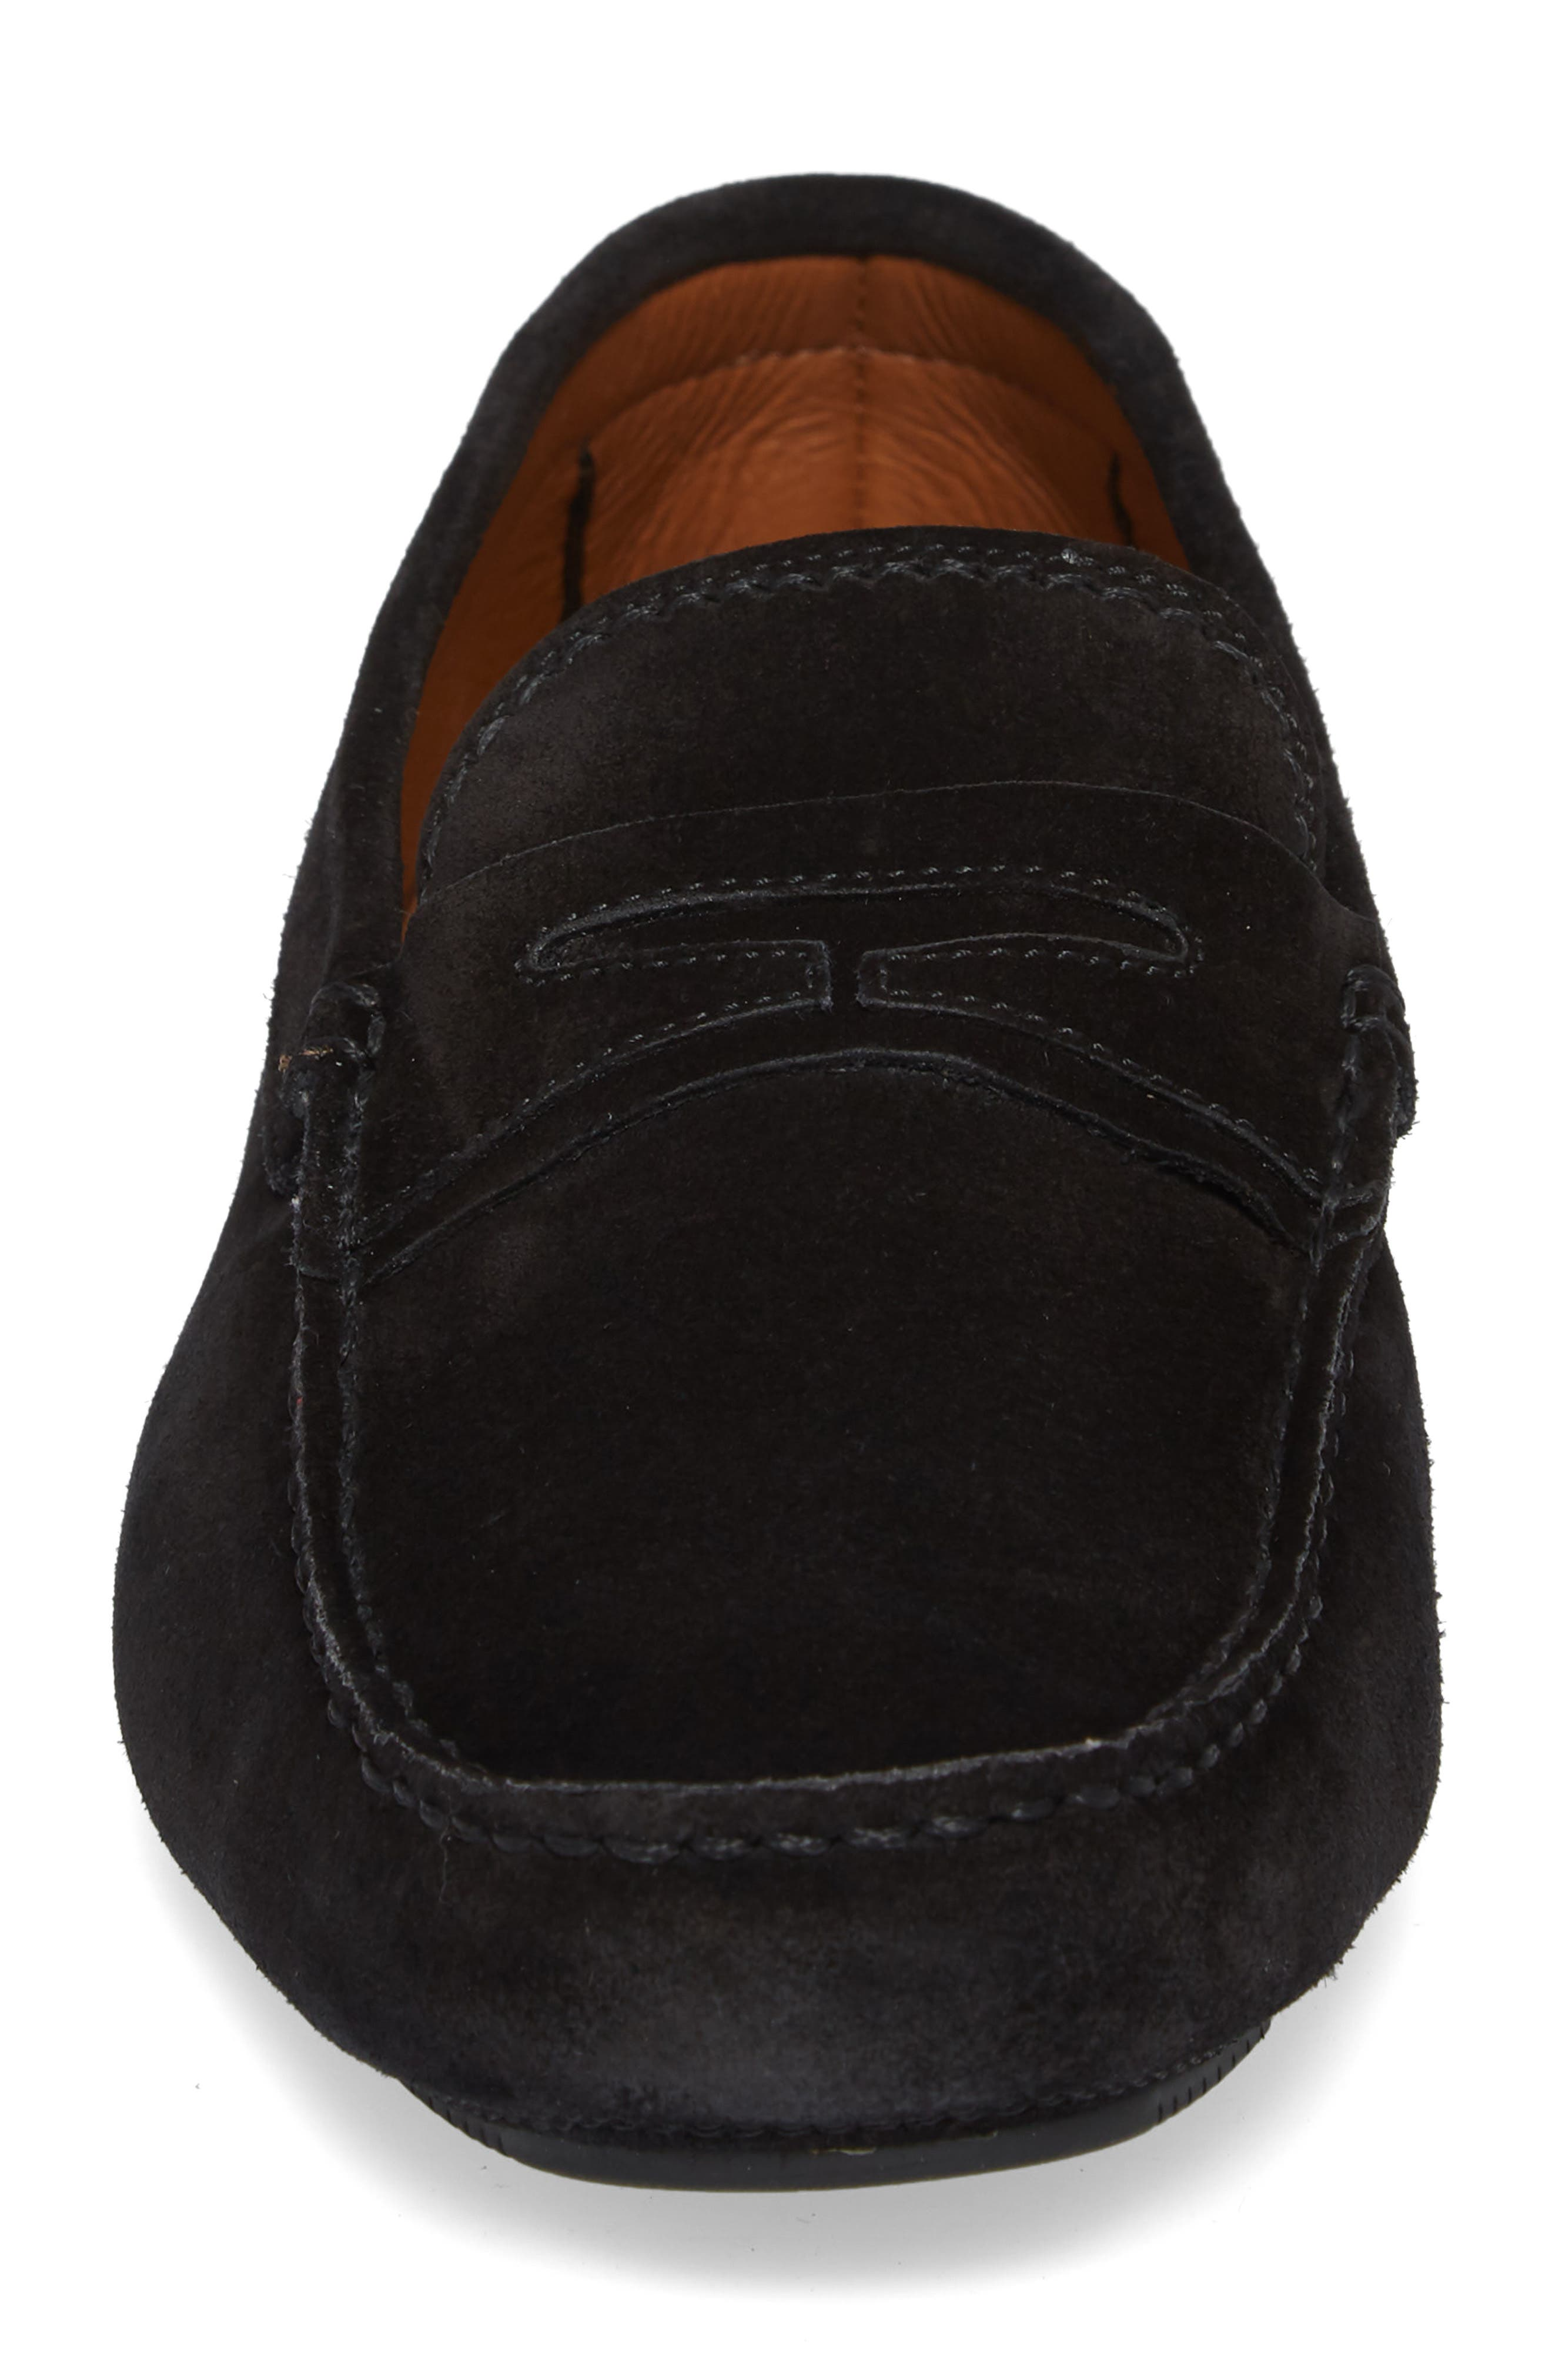 Brandon Weatherproof Driving Loafer,                             Alternate thumbnail 4, color,                             BLACK SUEDE